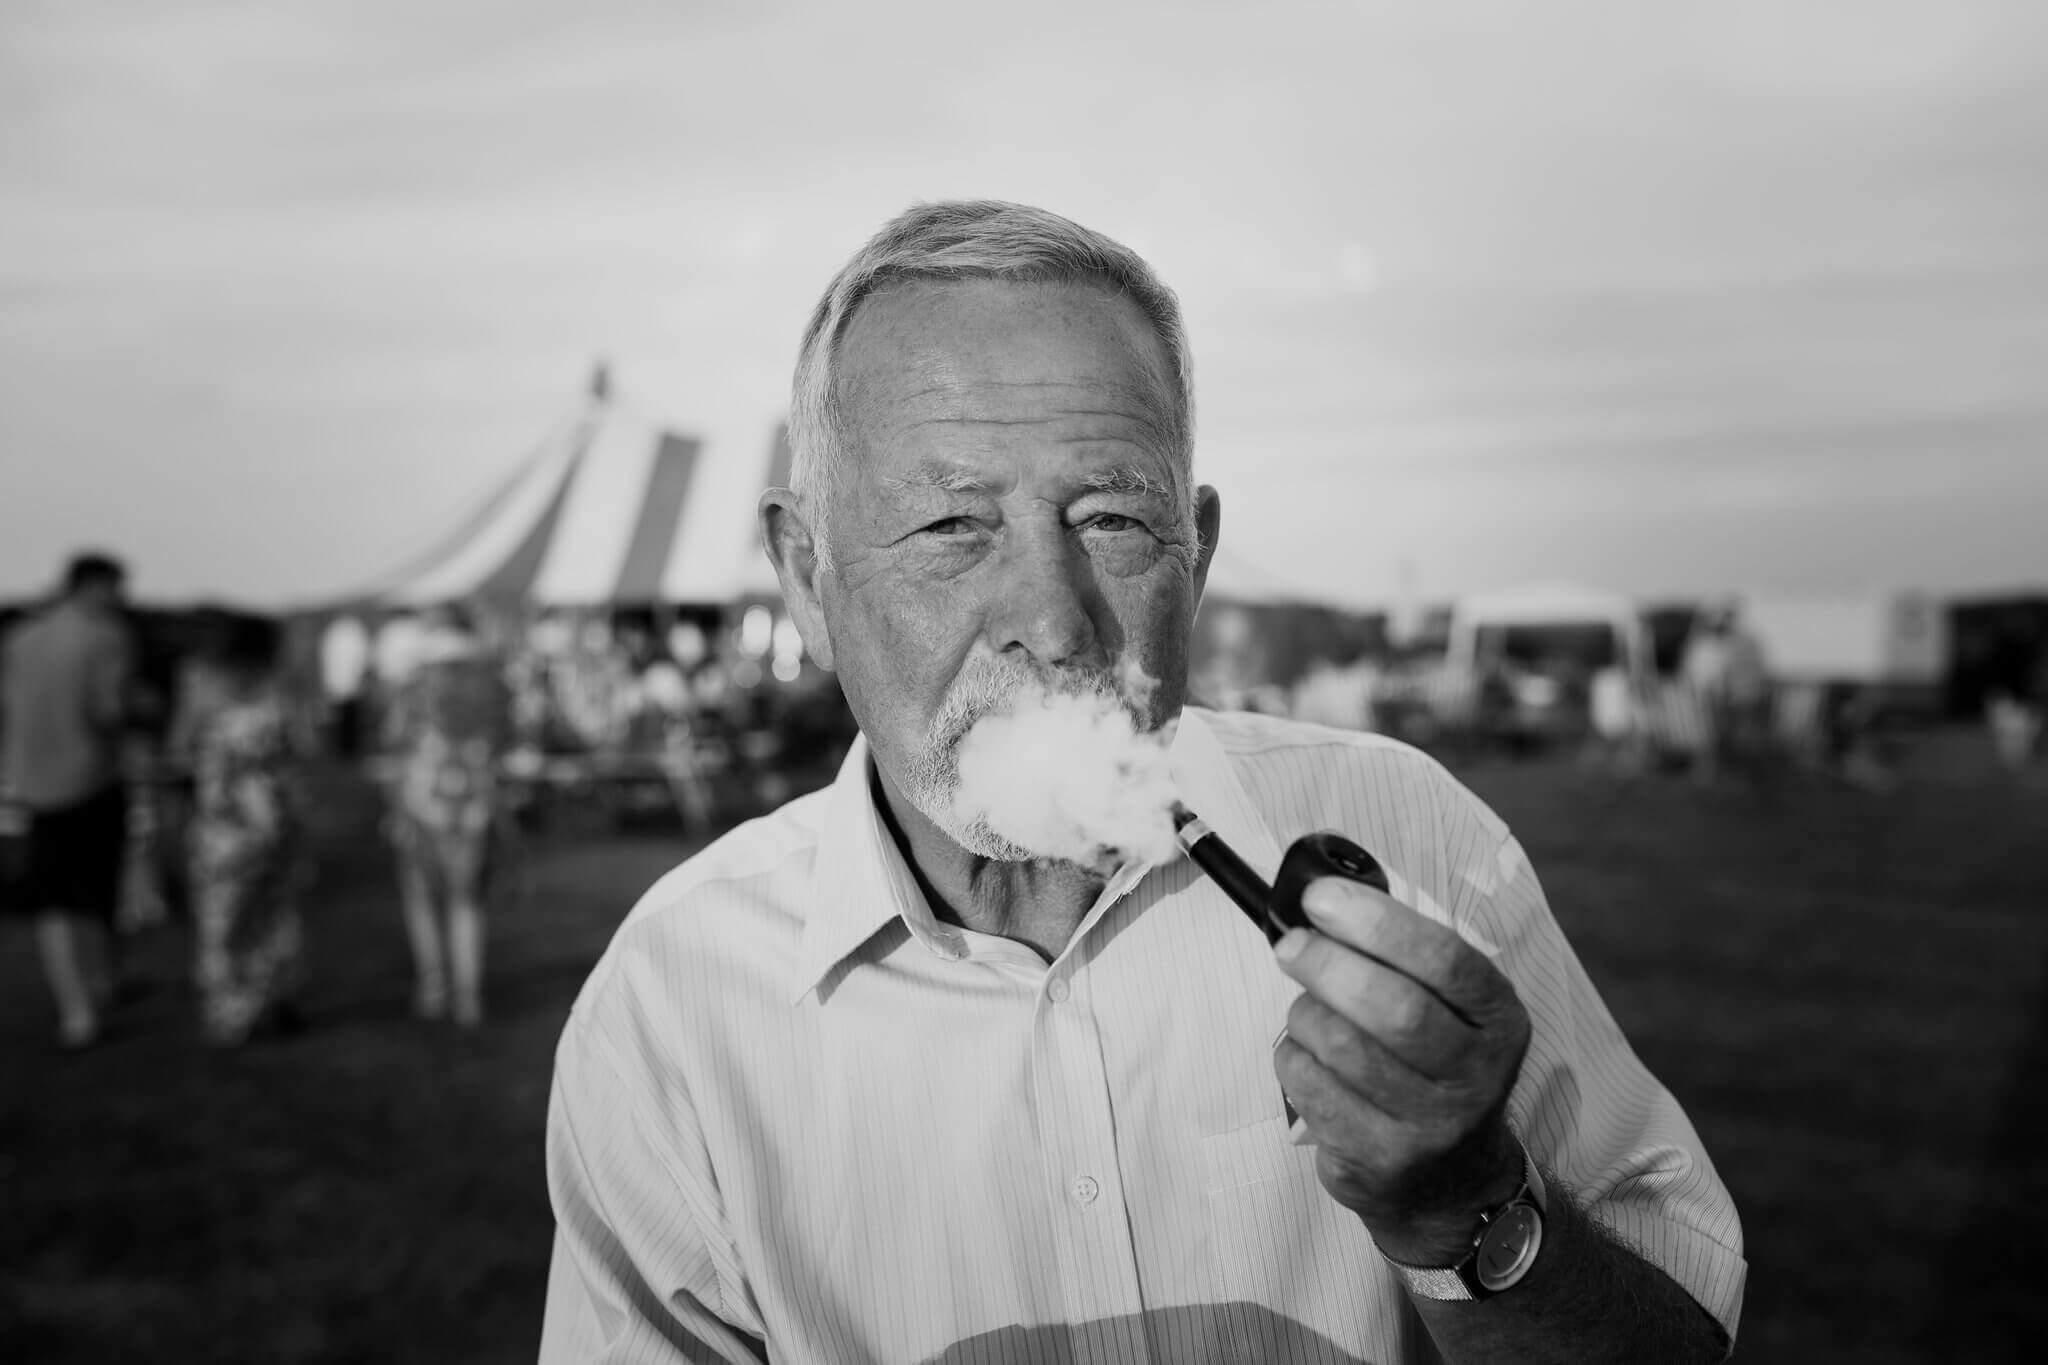 A pipe smoking Cornishman of course